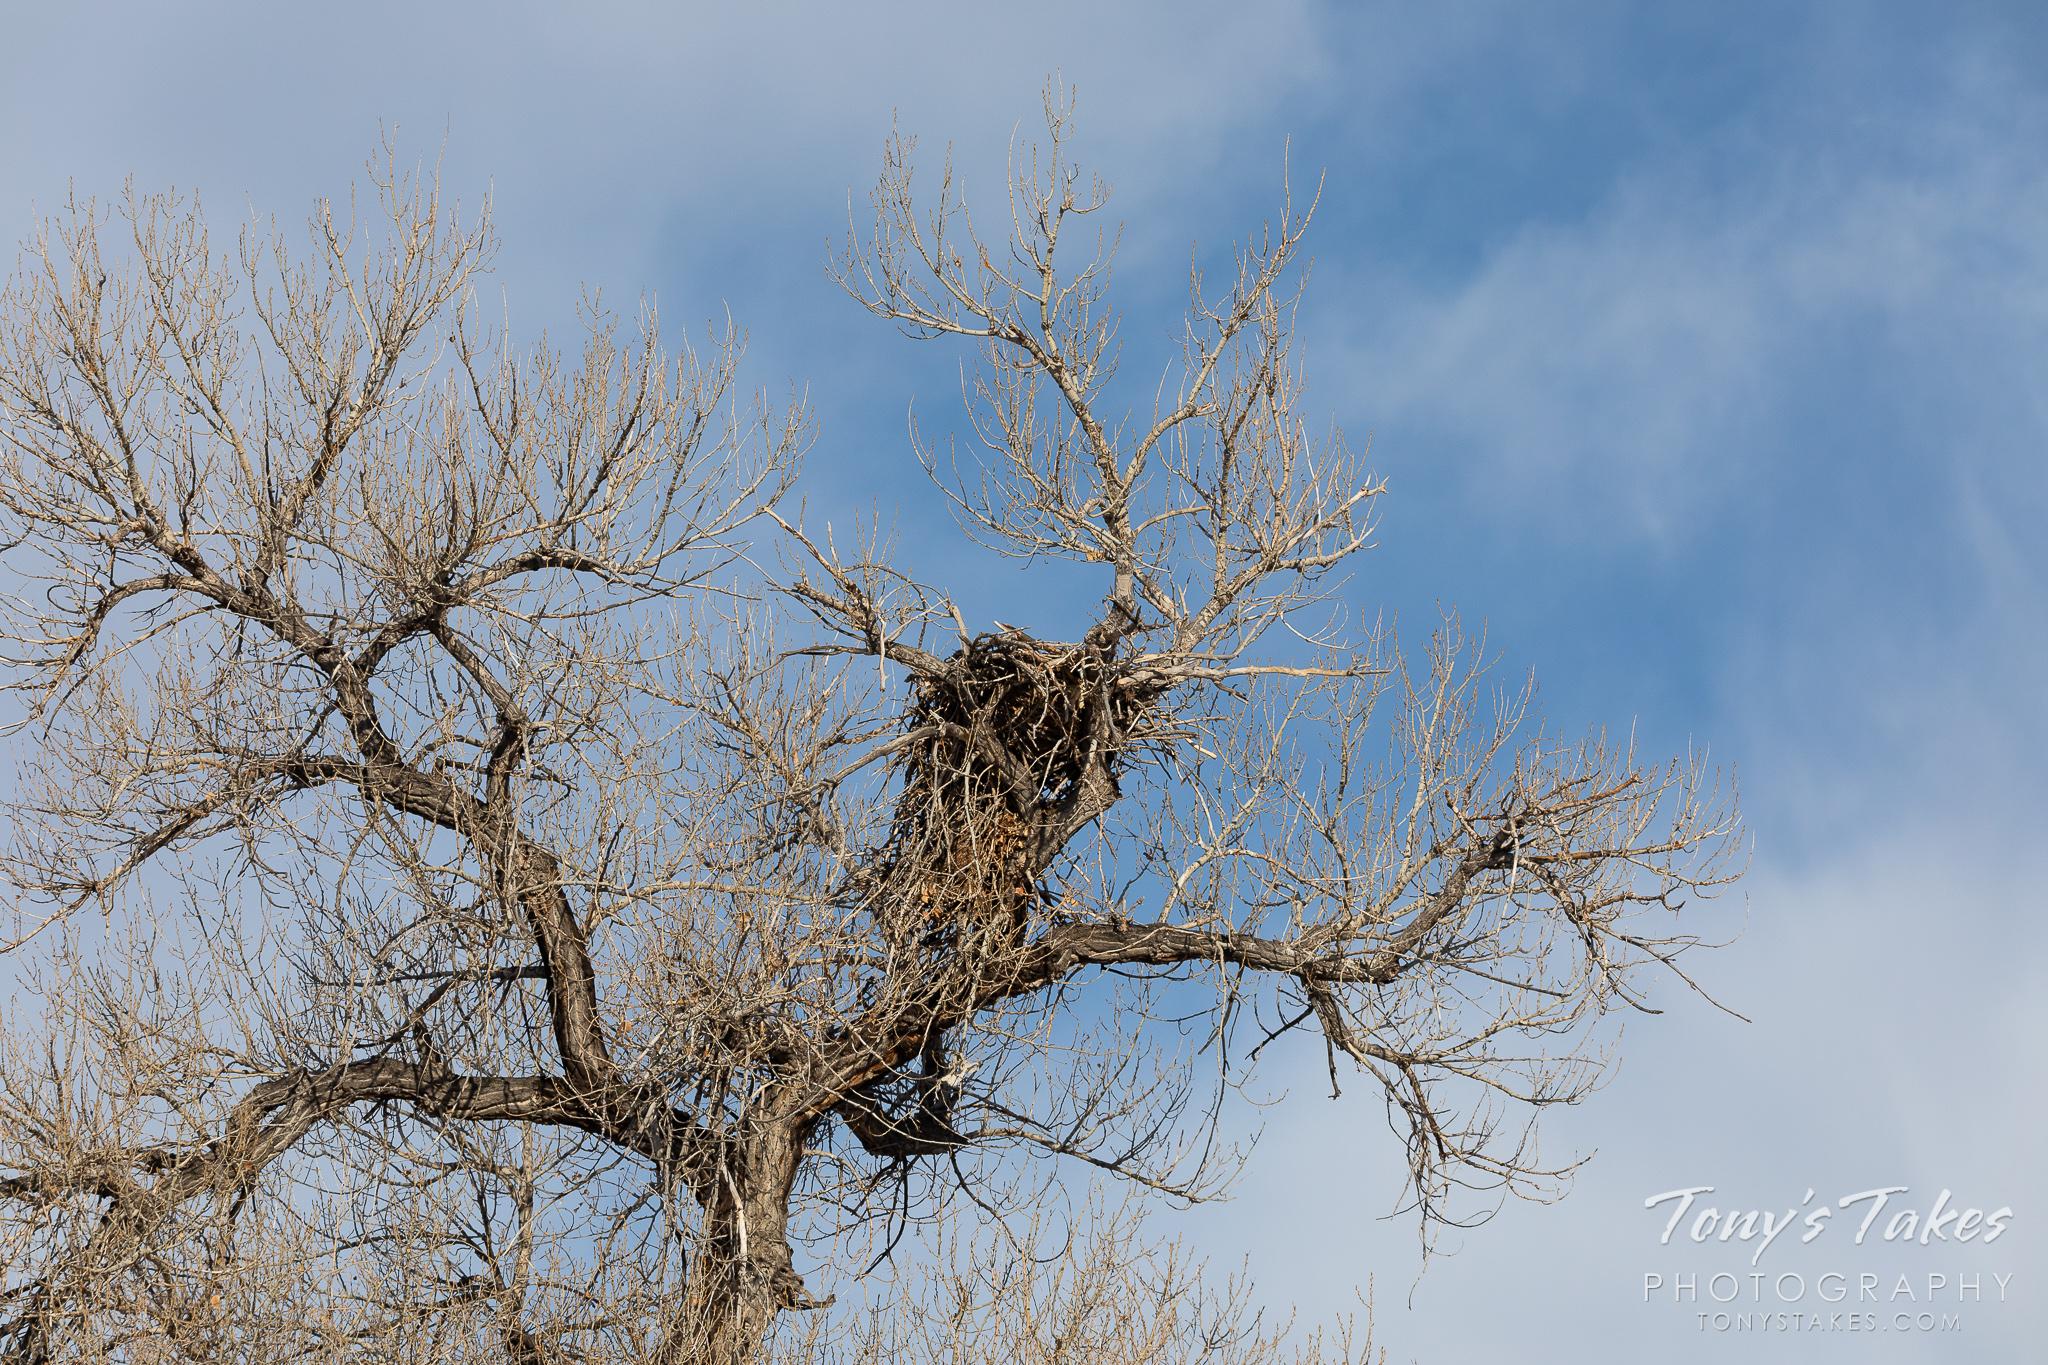 A bald eagle nest sits empty after a failed season. (© Tony's Takes)